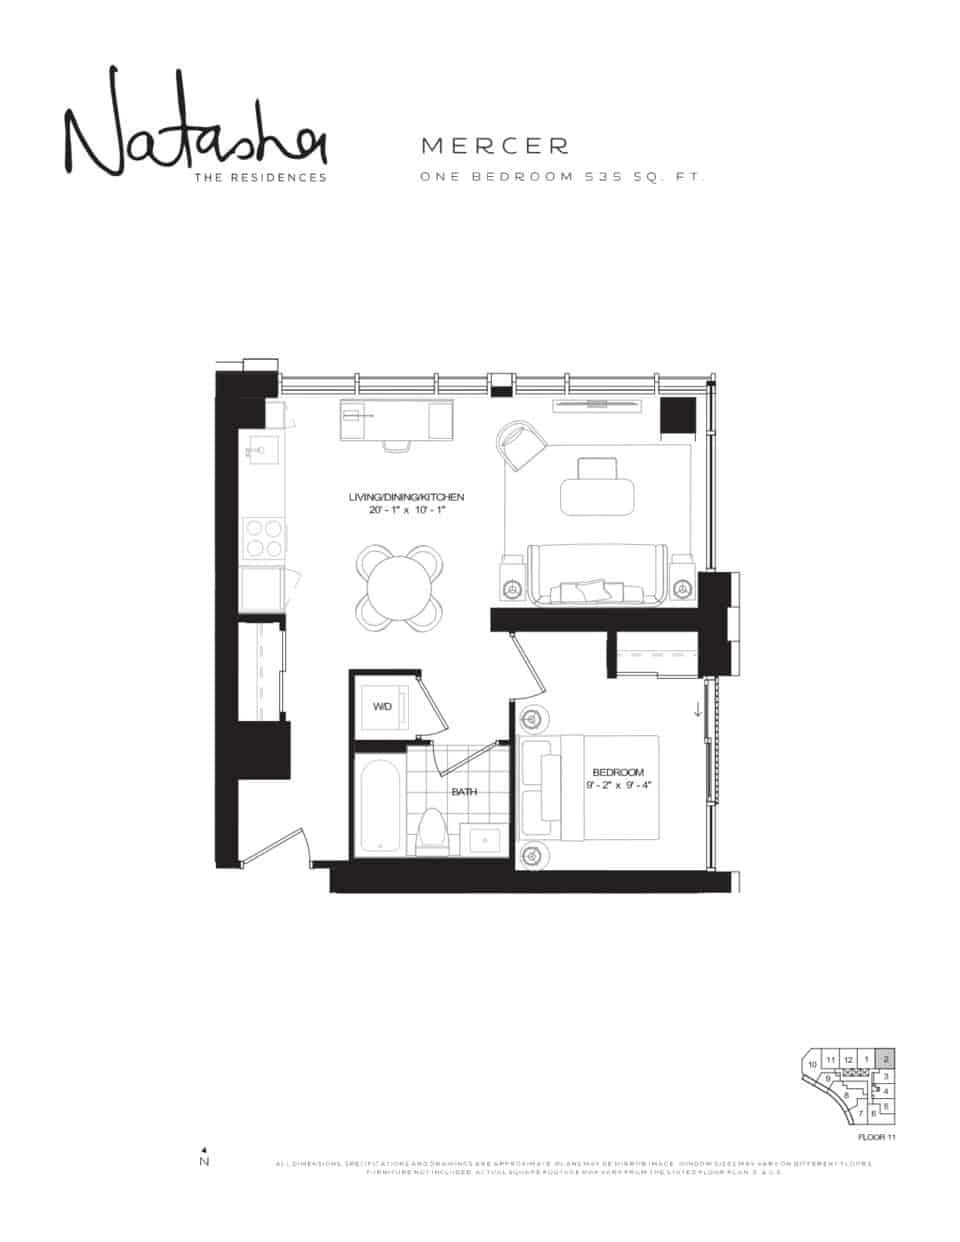 2021 09 02 11 02 35 natashatheresidences lanterradevelopments floorplans mercer